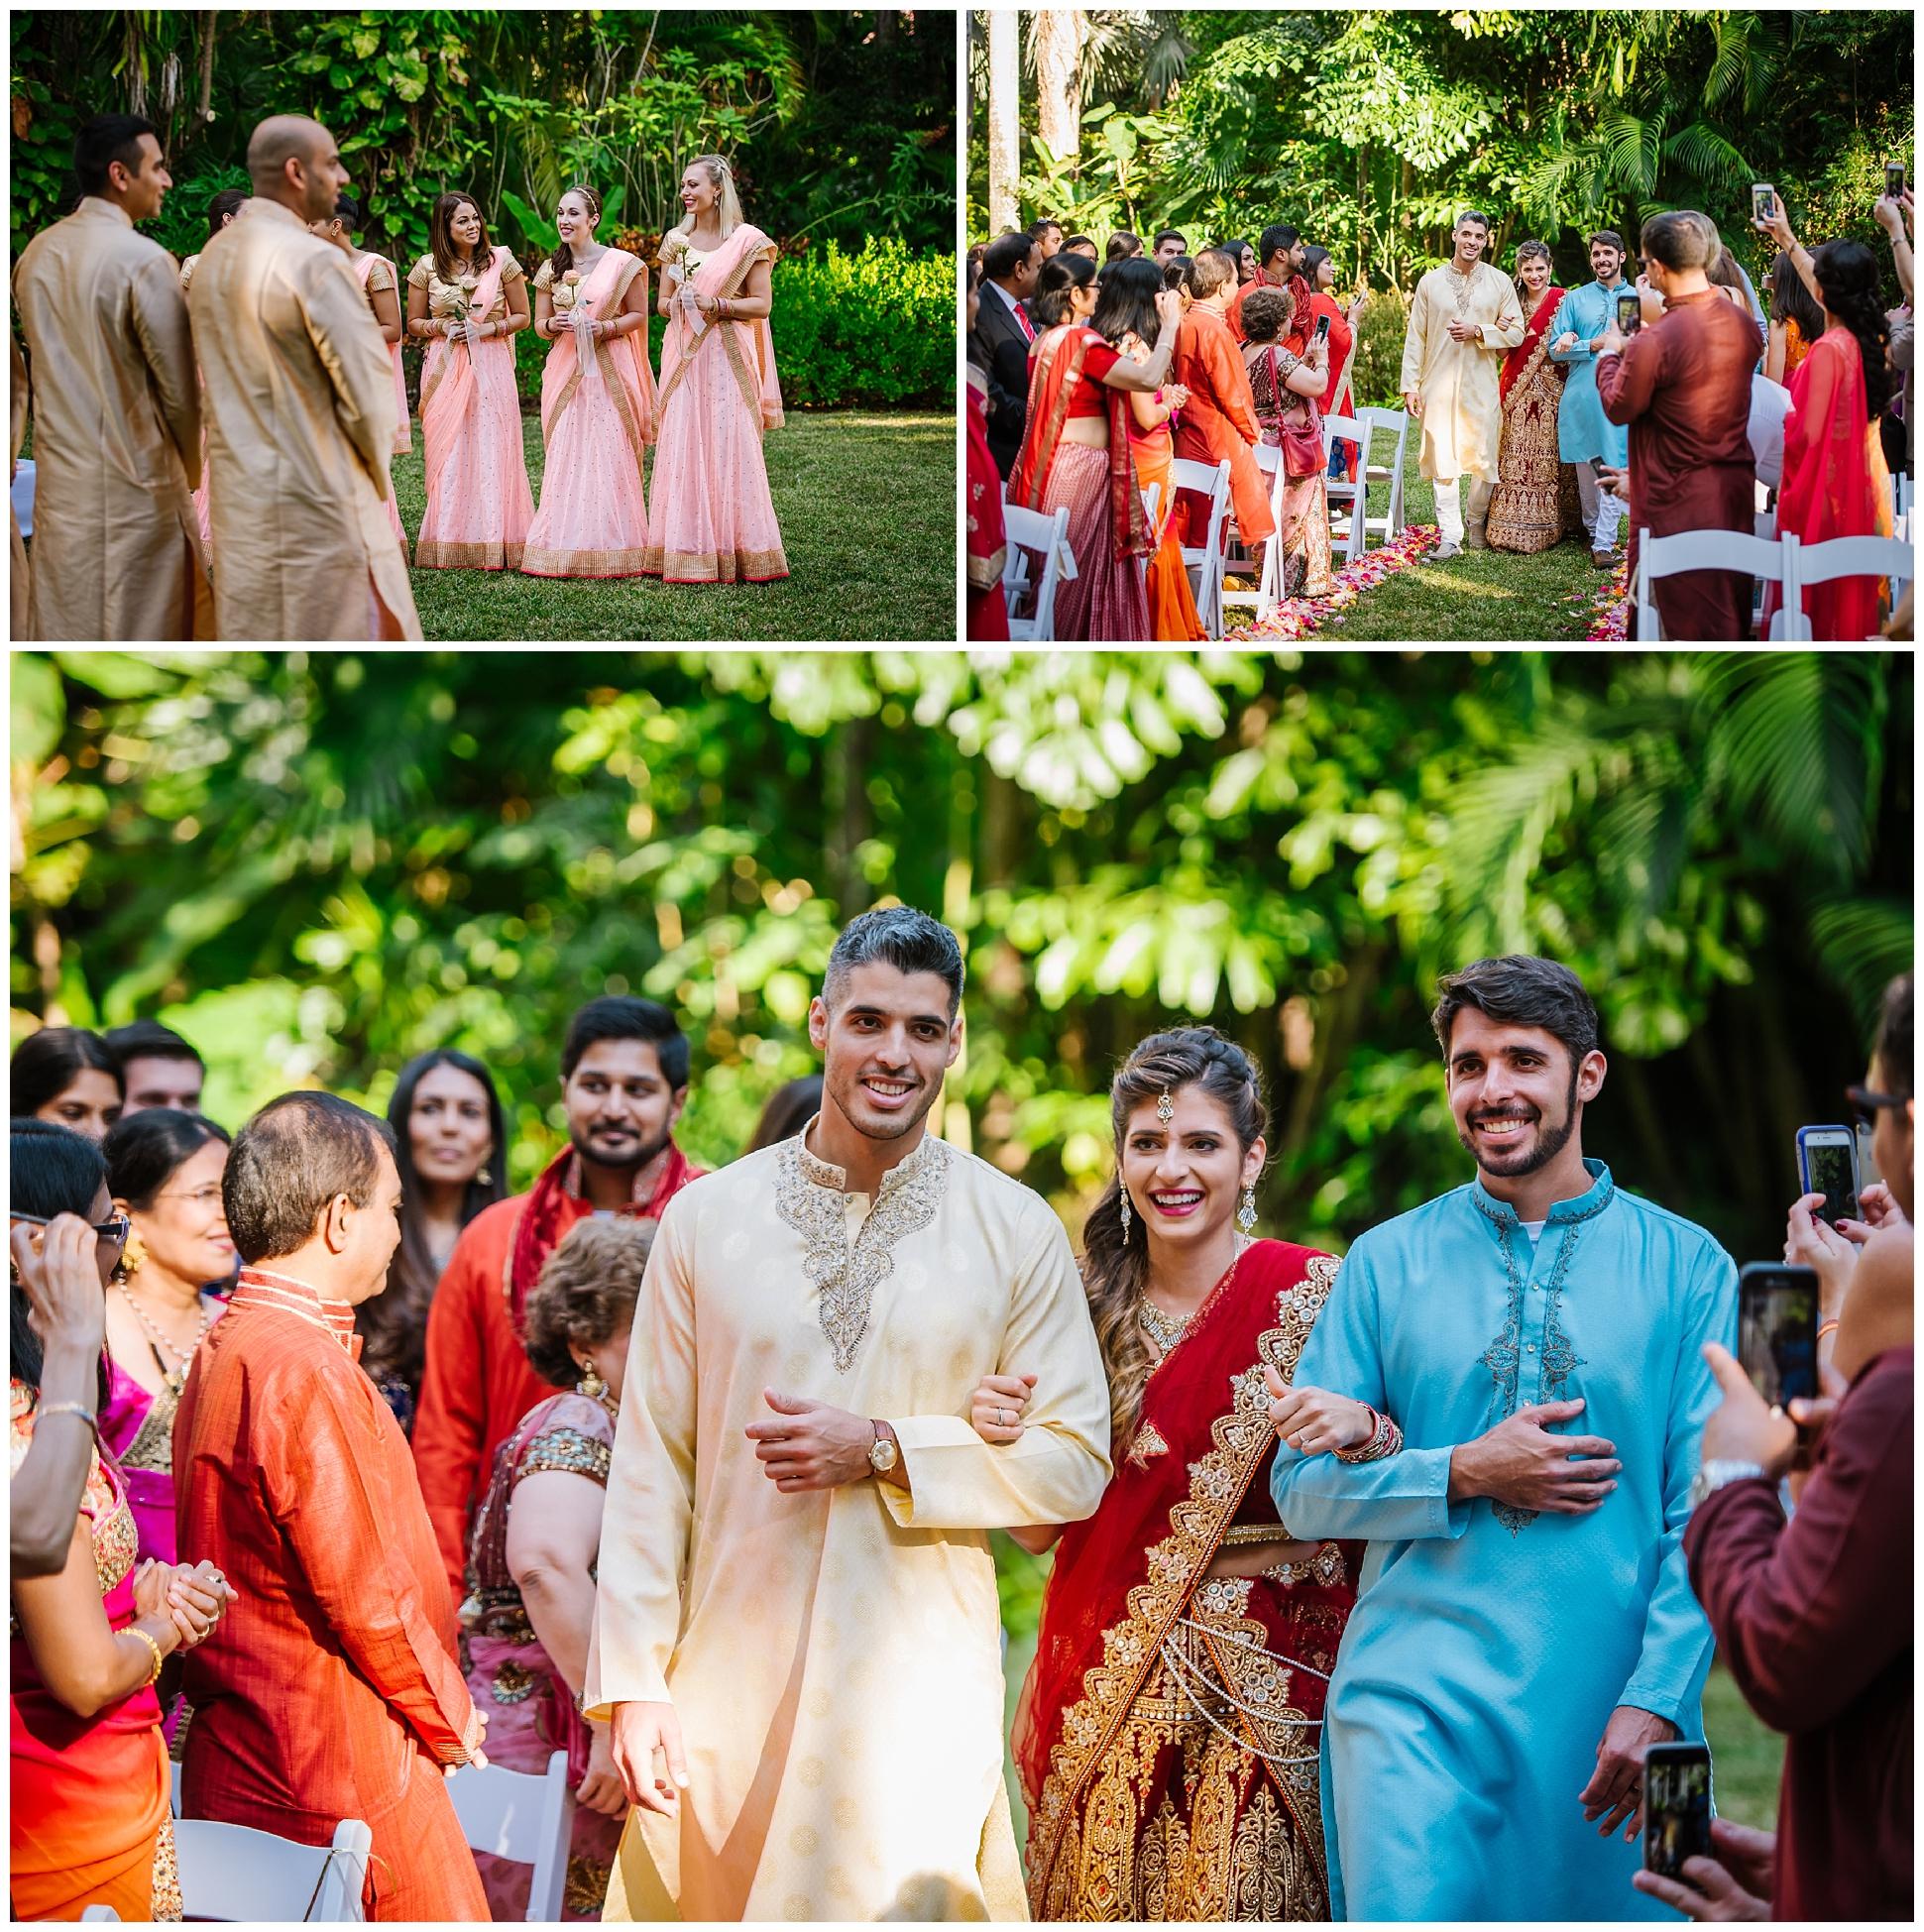 St-pete-indian-wedding-photographer-barat-sunken-gardens_0105.jpg